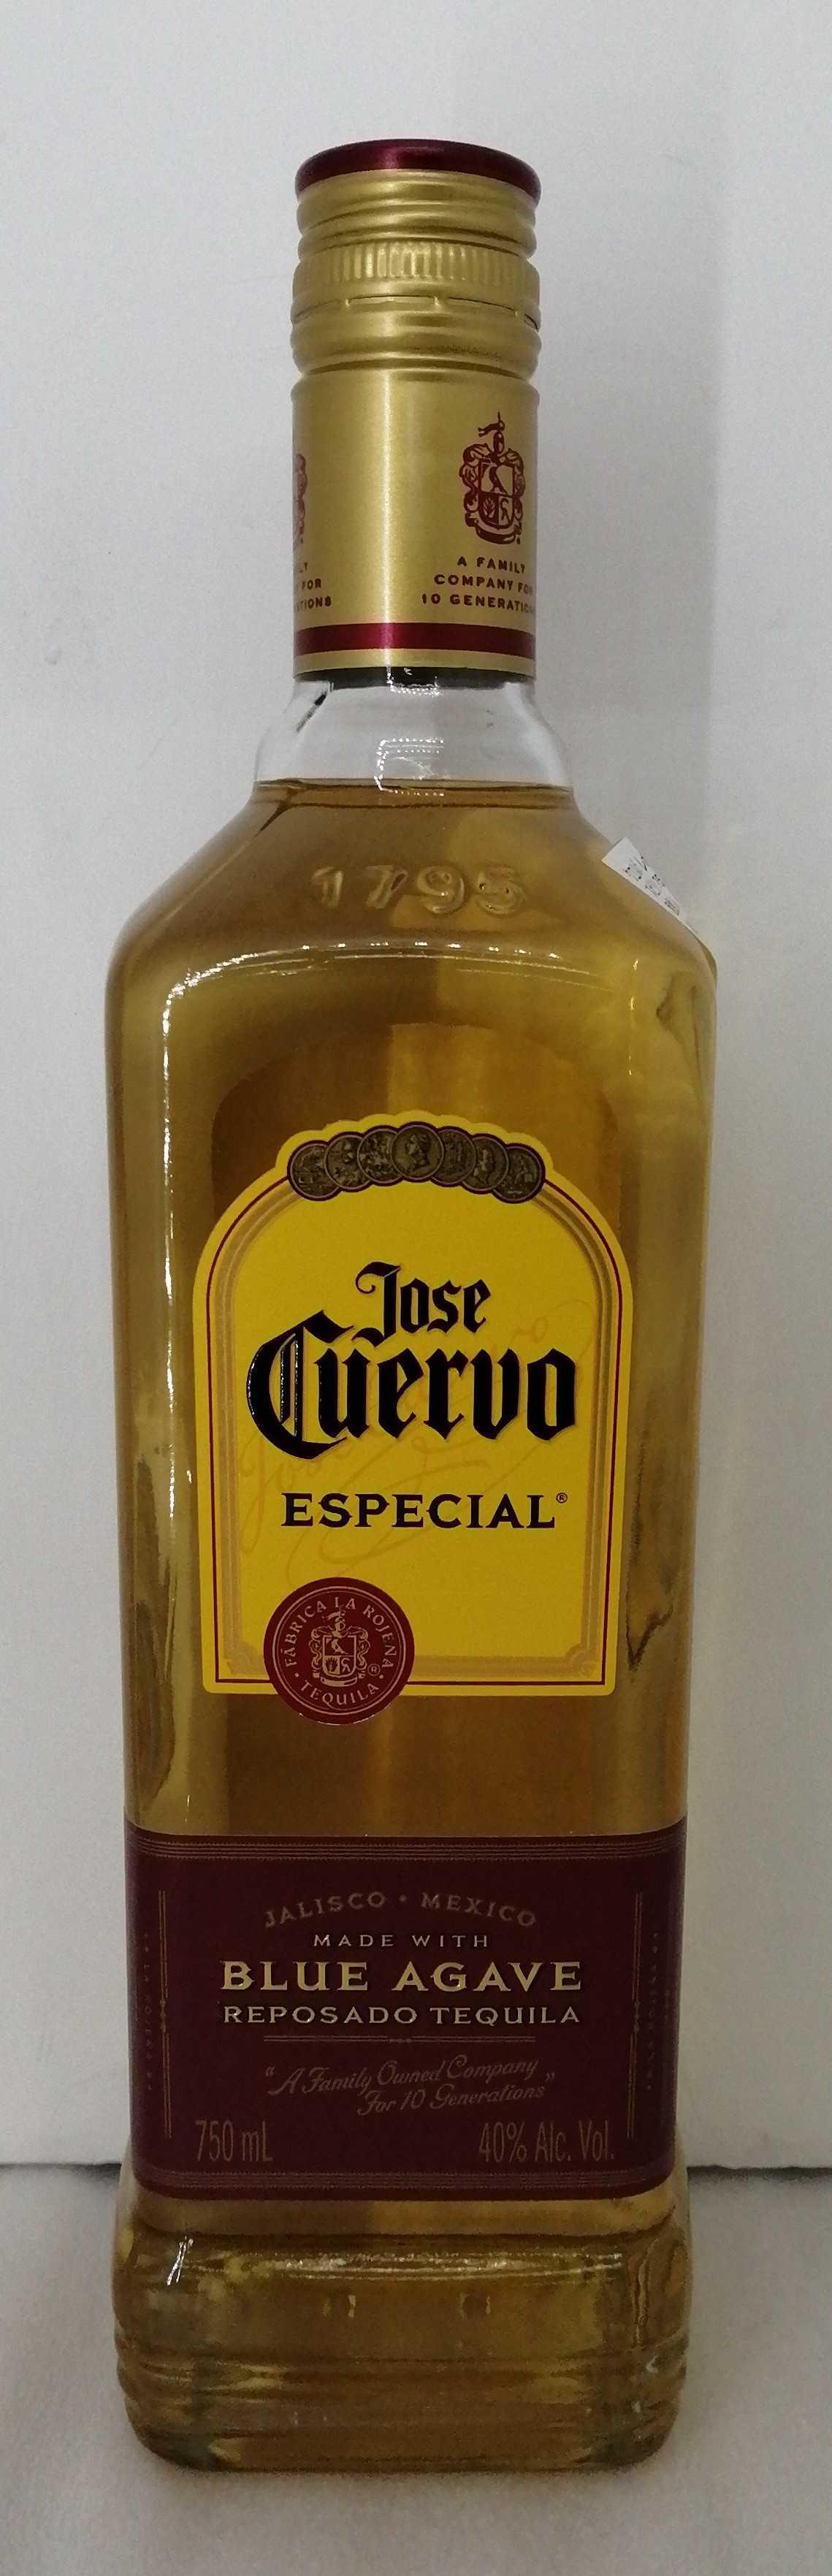 900163490|JOSE CUERVO